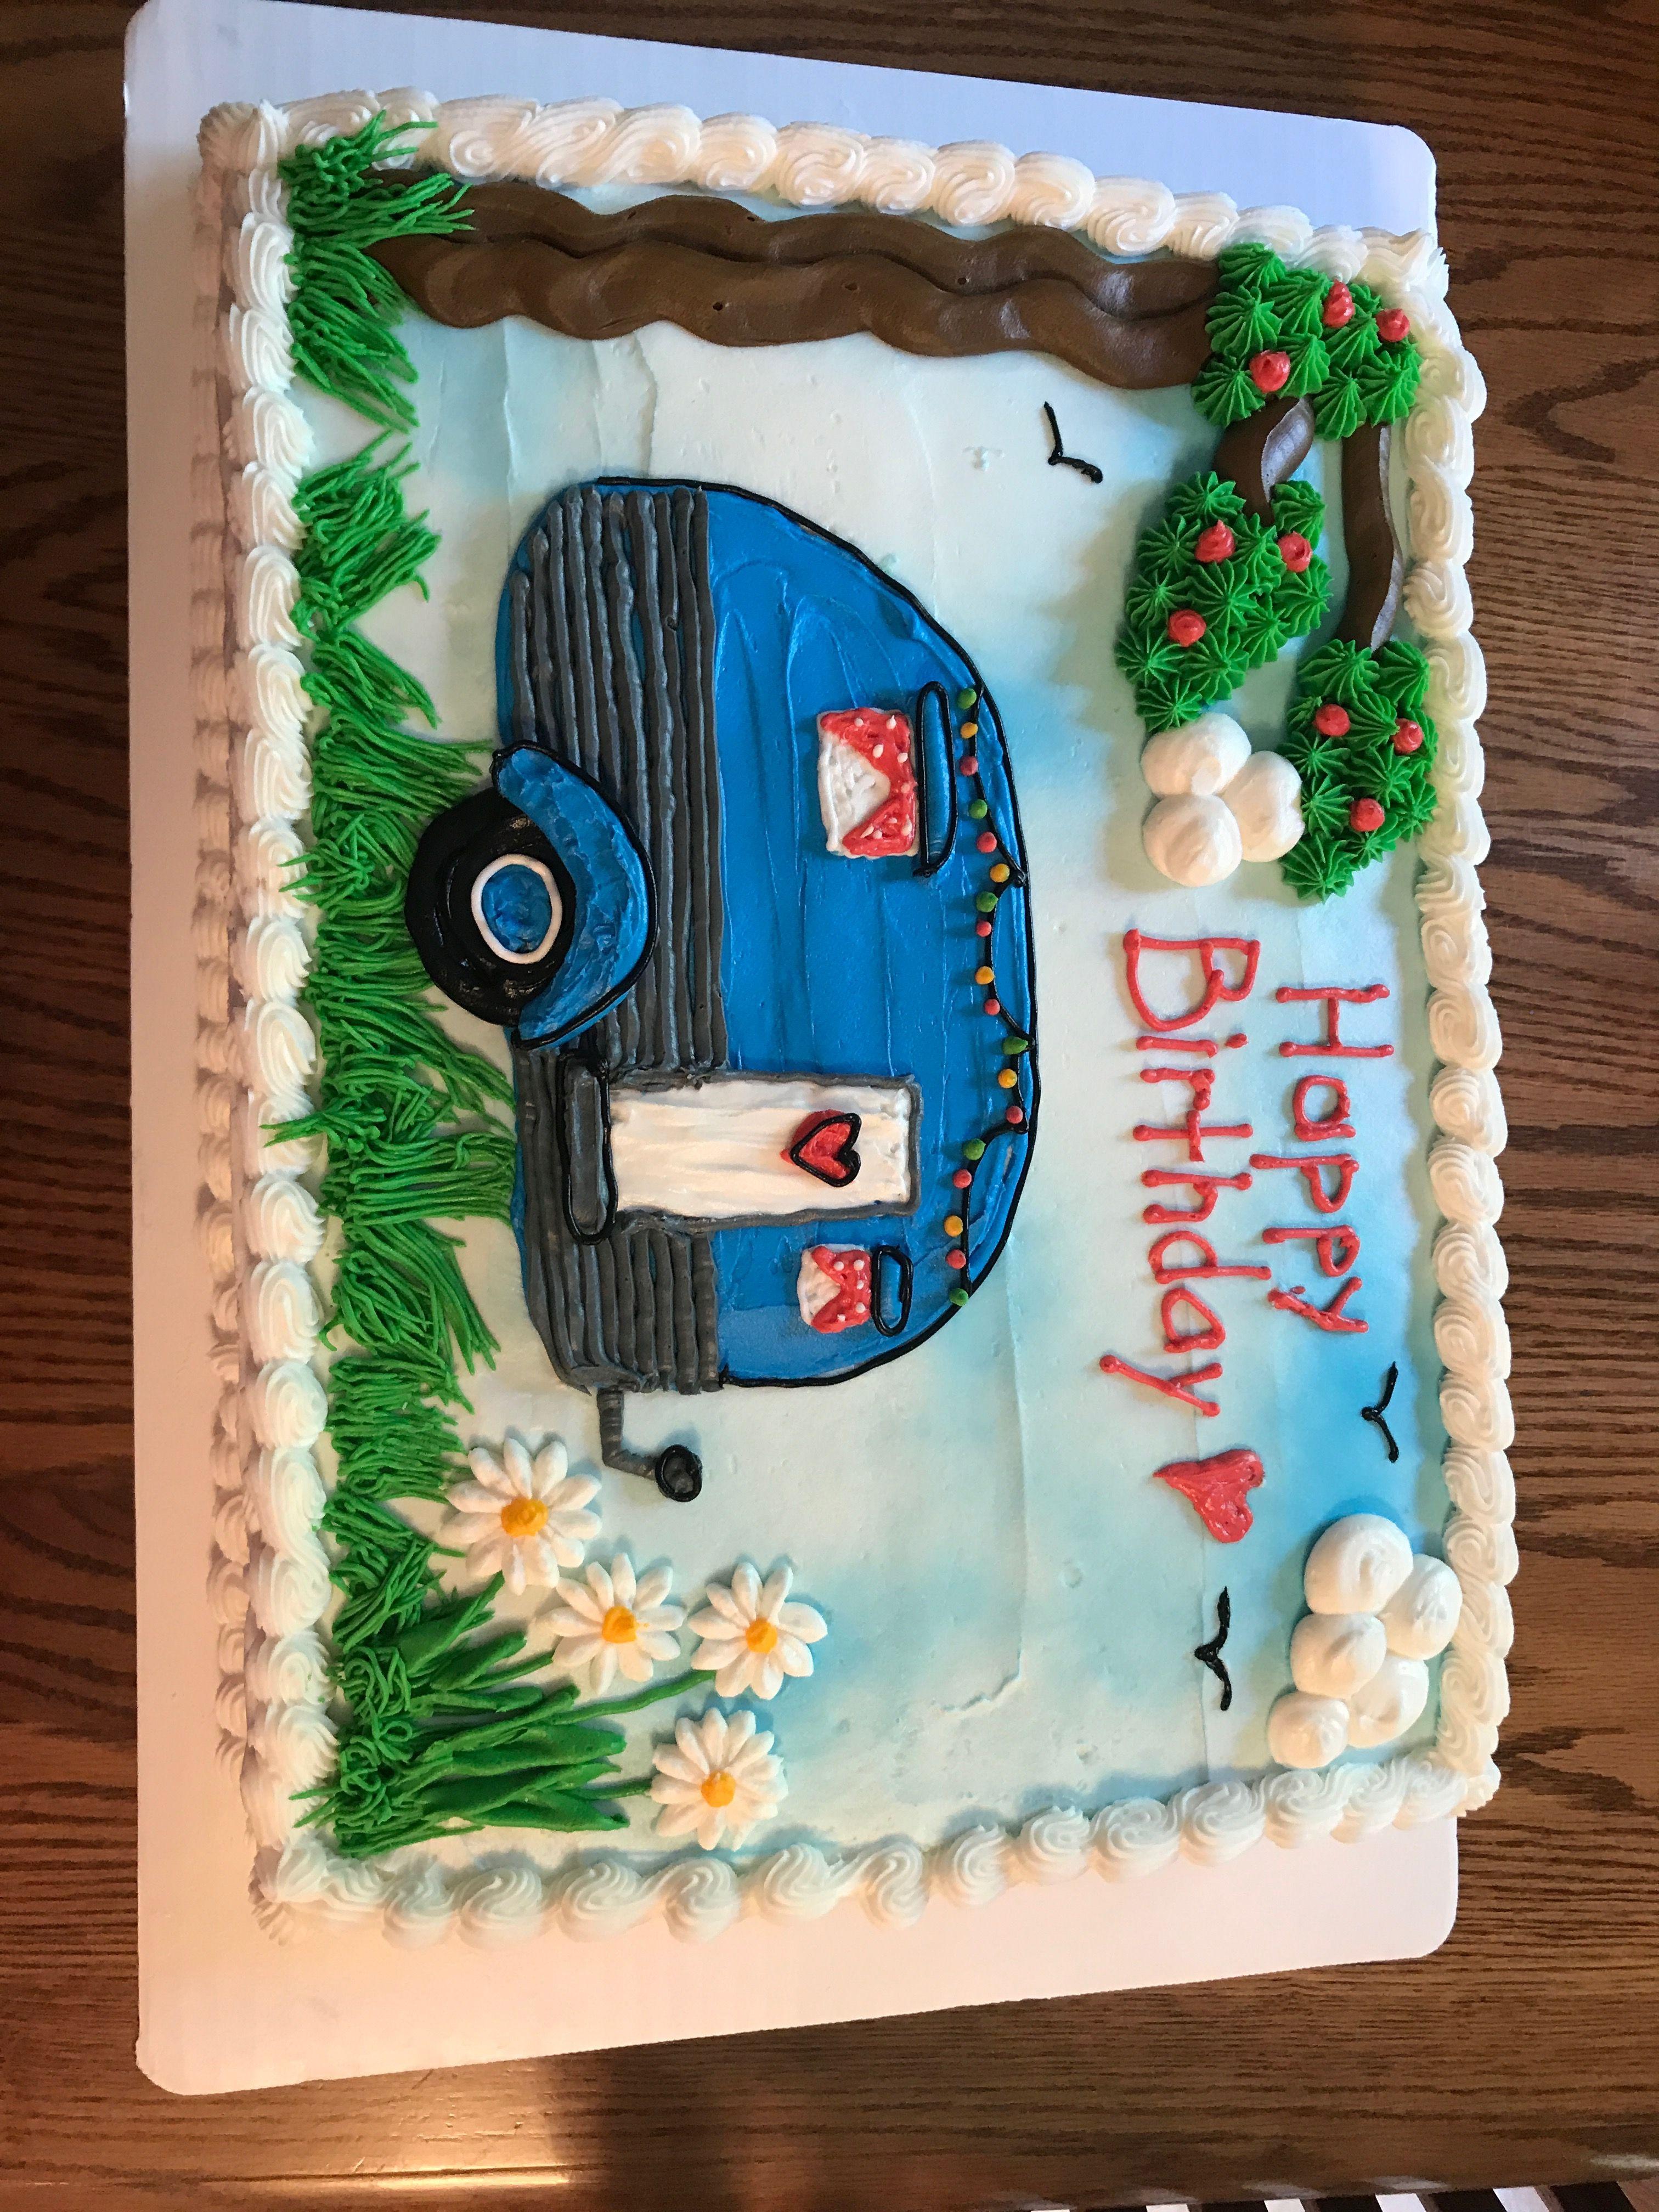 Camper camping Birthday cake   Camping birthday cake, Cake ...